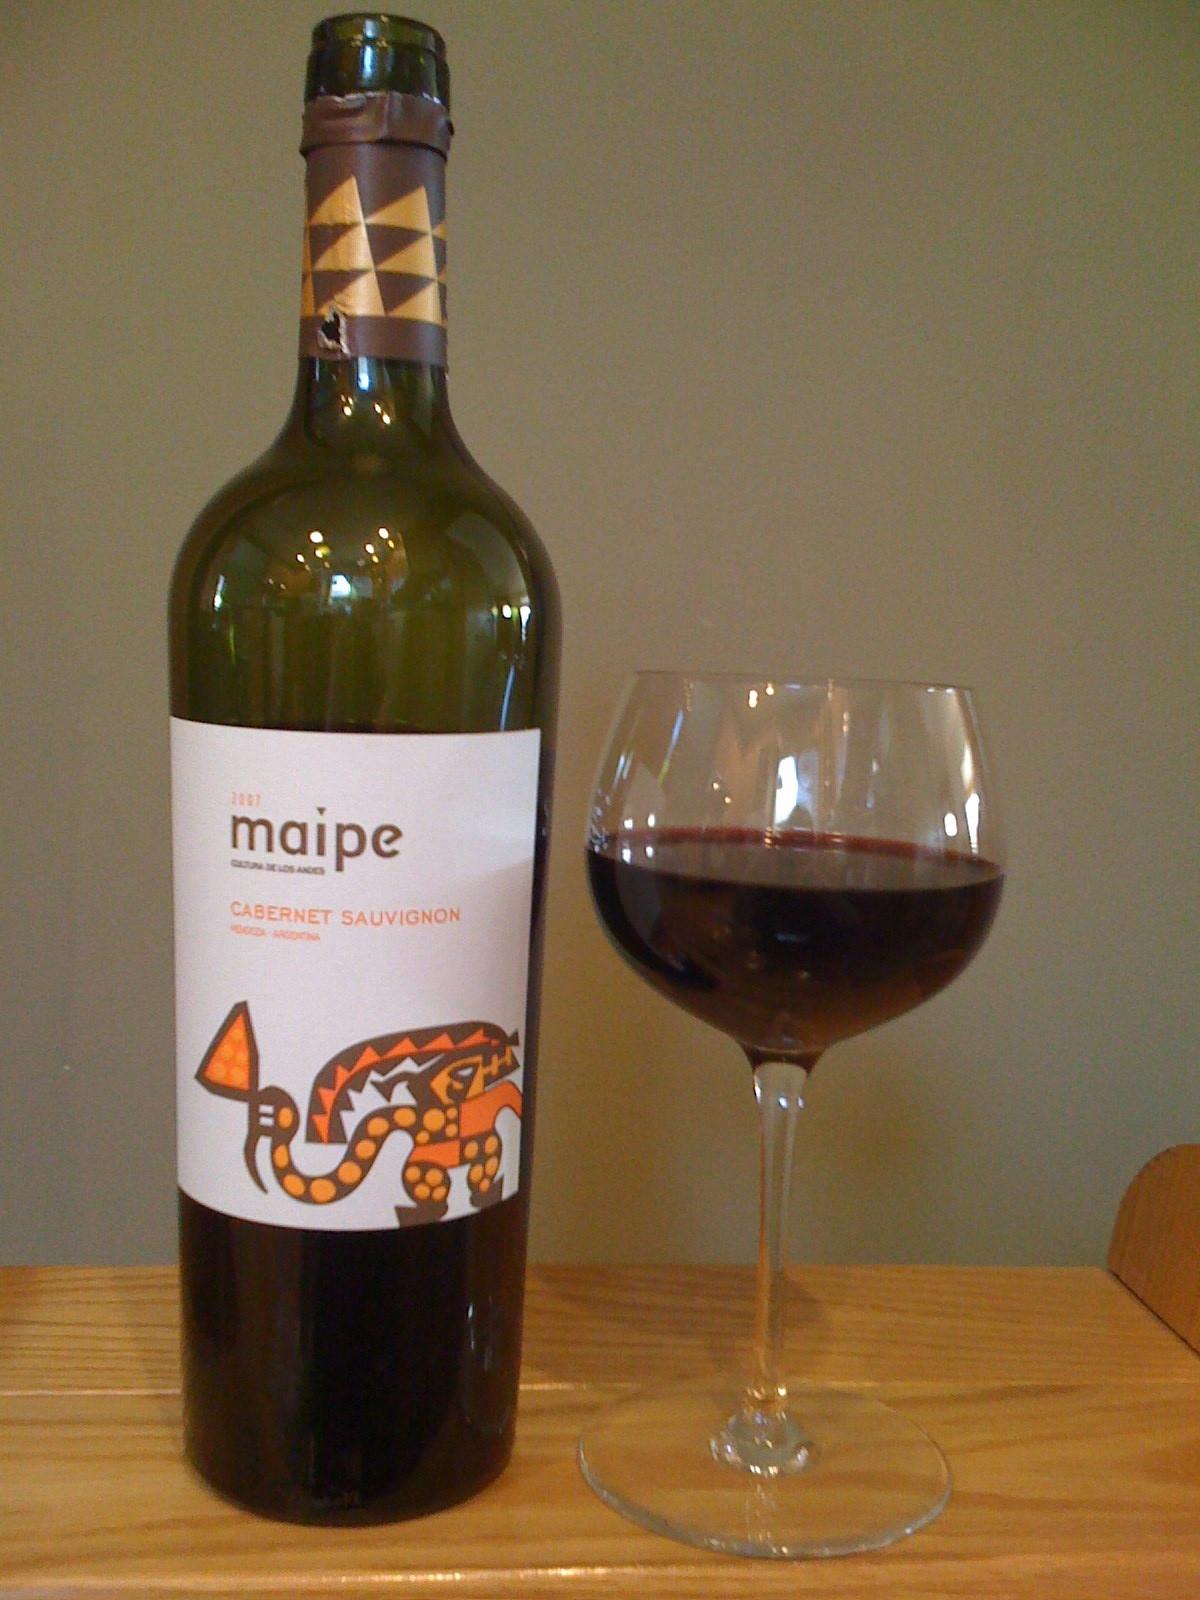 Maipe Cabernet Sauvignon (2007)